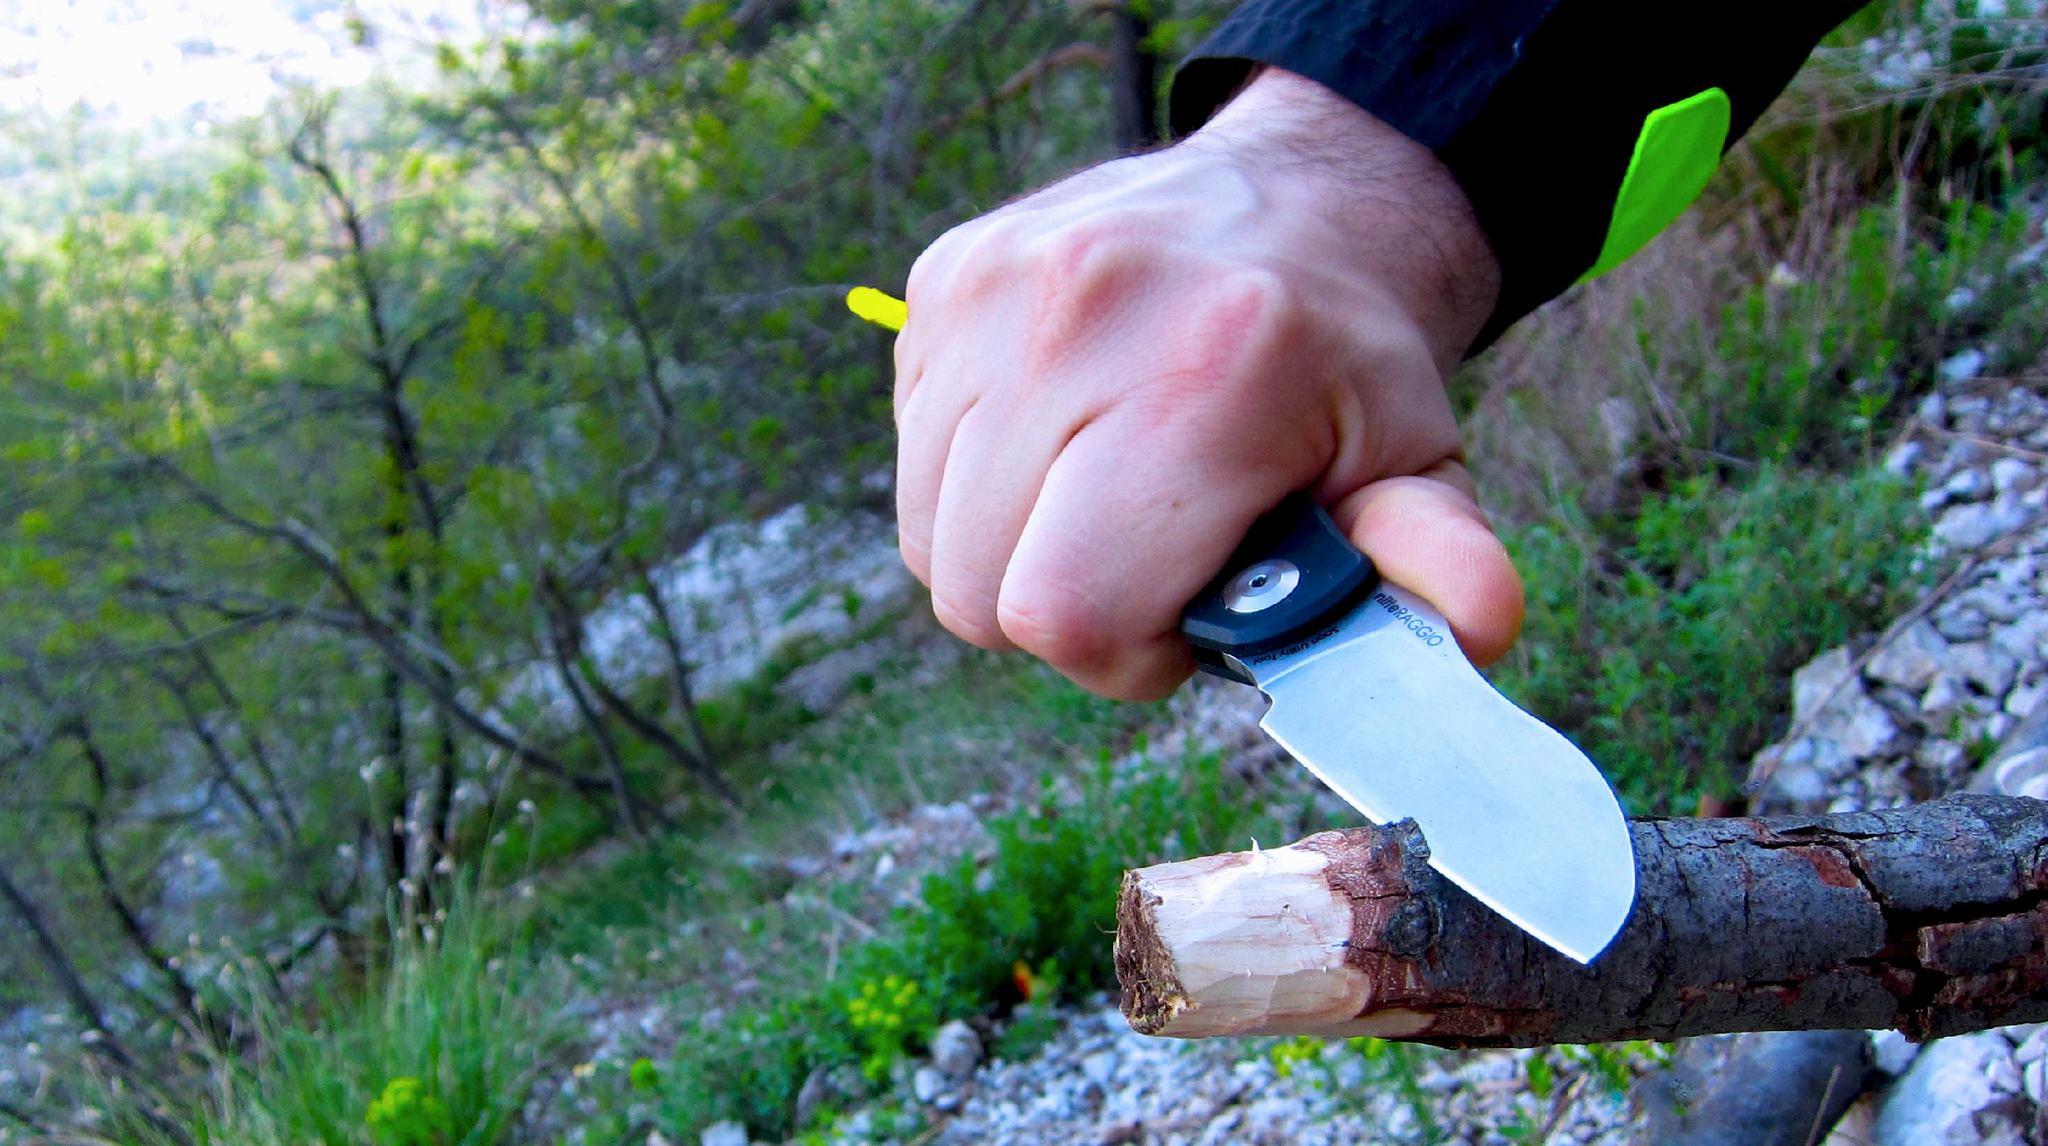 Фото 13 - Нож складной Fantoni, Raggio, FAN/NilteRAGGIO, сталь Sandvik 14C28N, рукоять Ixef, чёрный